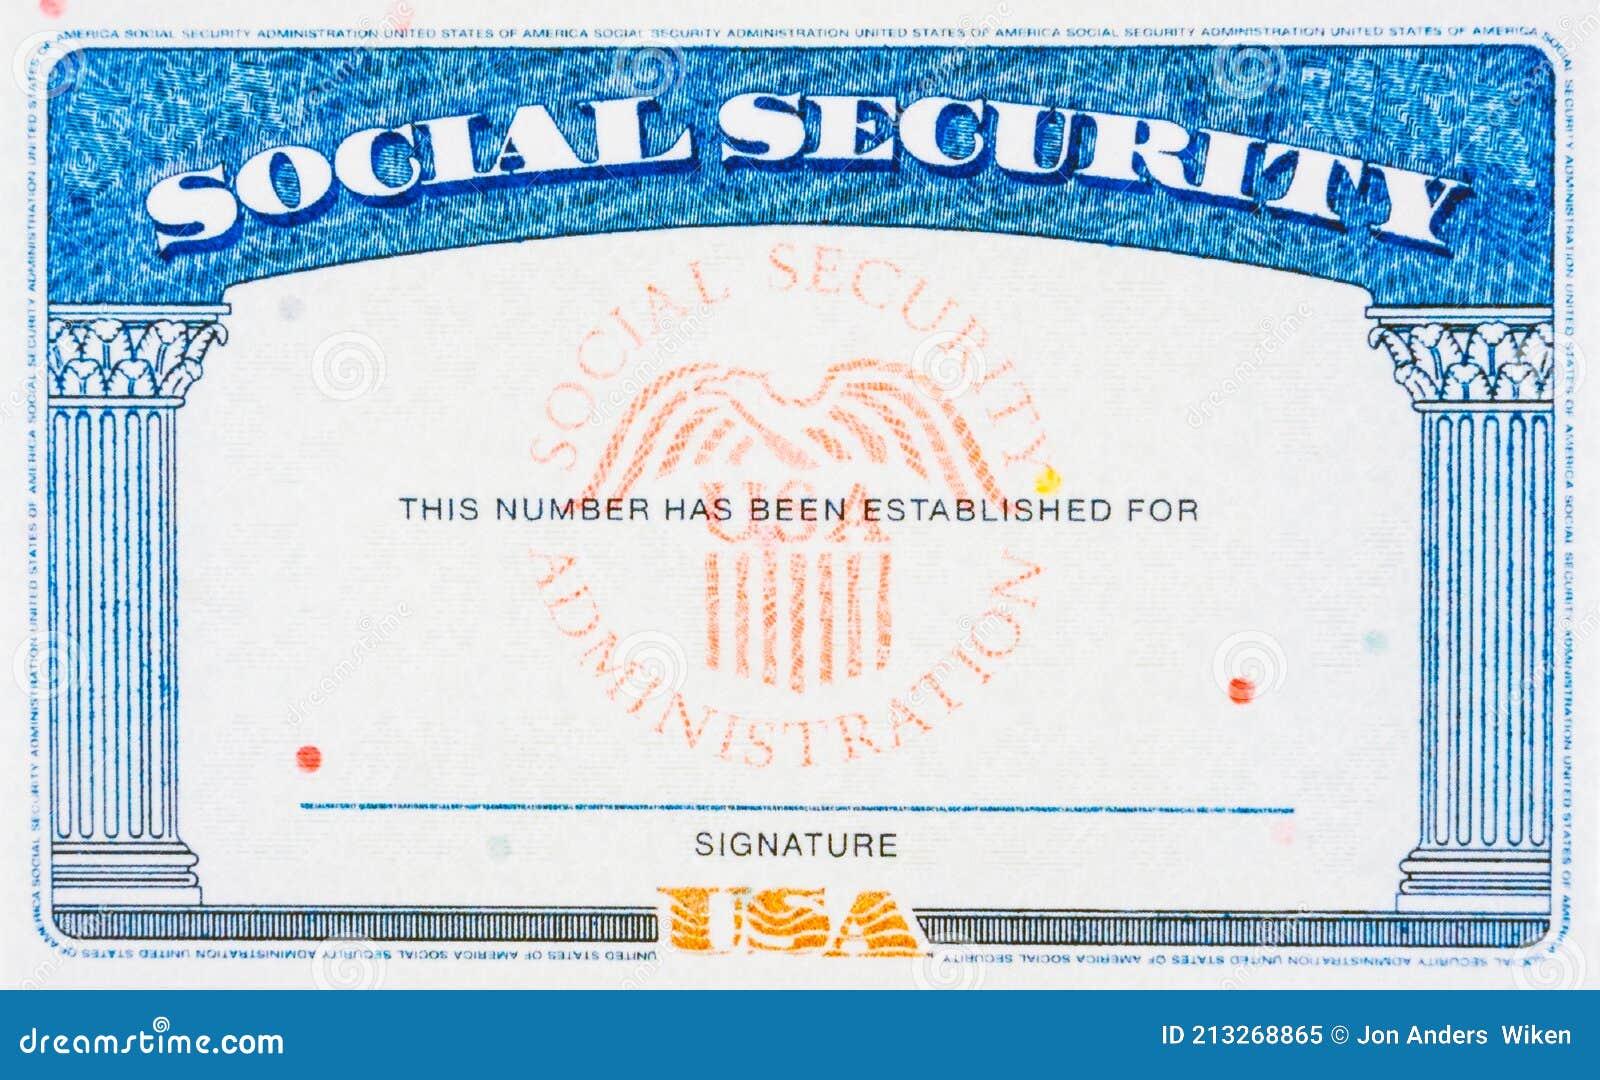 22,22,222 Blanko Fotos - Kostenlose und Royalty-Free Stock-Fotos Regarding Fake Social Security Card Template Download